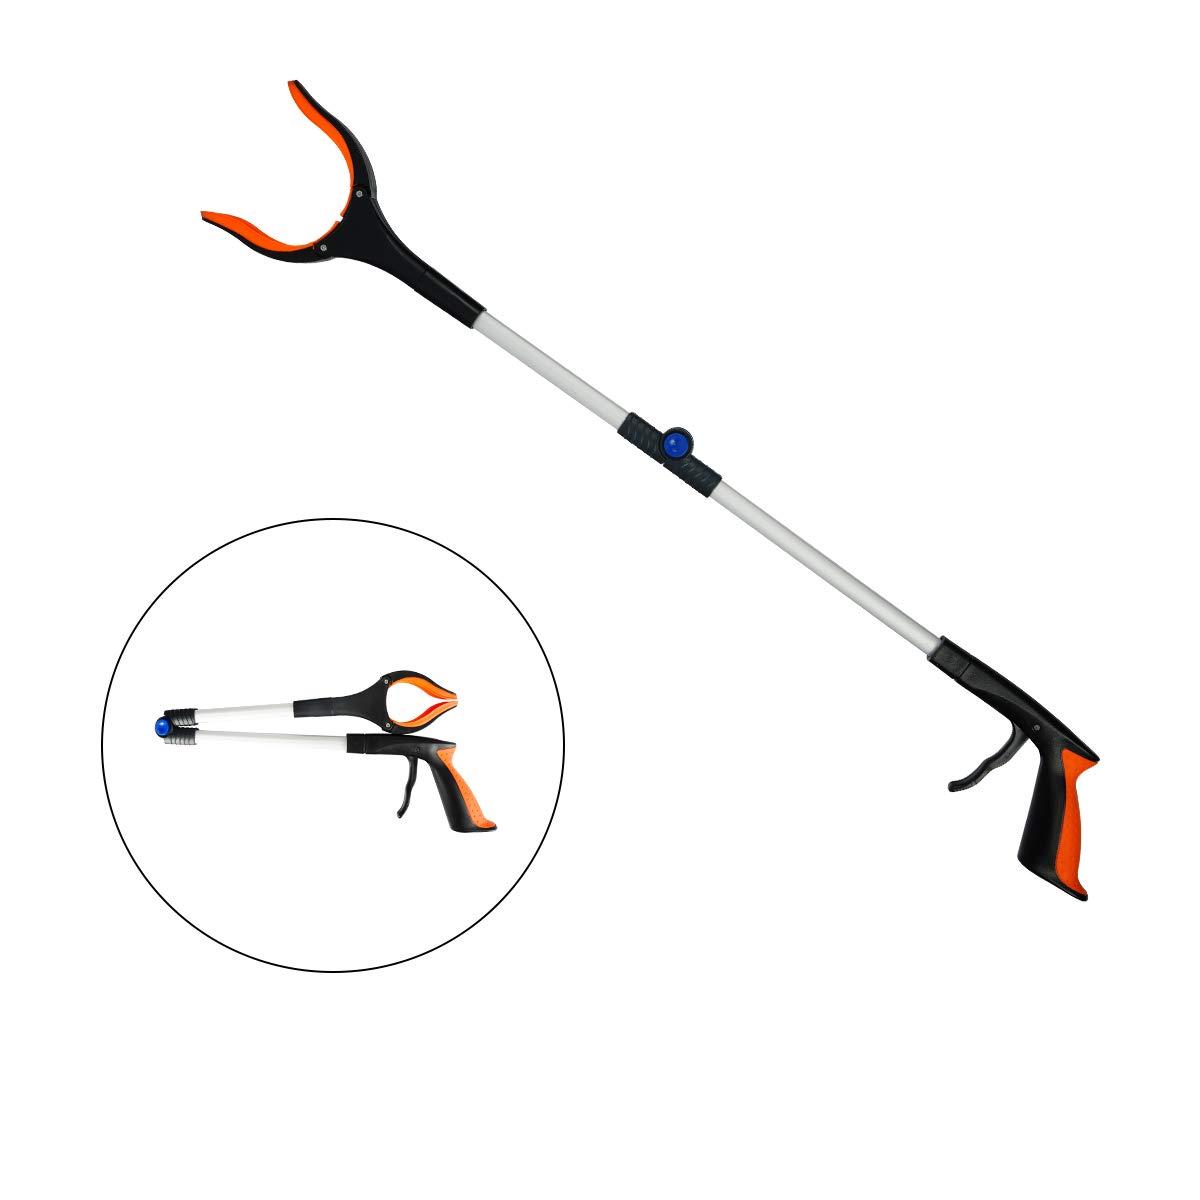 Lakaw 32'' Lightweight Extra Long Handy Trash Claw Grabber, Grabber Reacher Tool, Foldable Litter Picker, Arm Extension, Rubber Head, Rubber Grip, Orange(1 Pack) by Lakaw